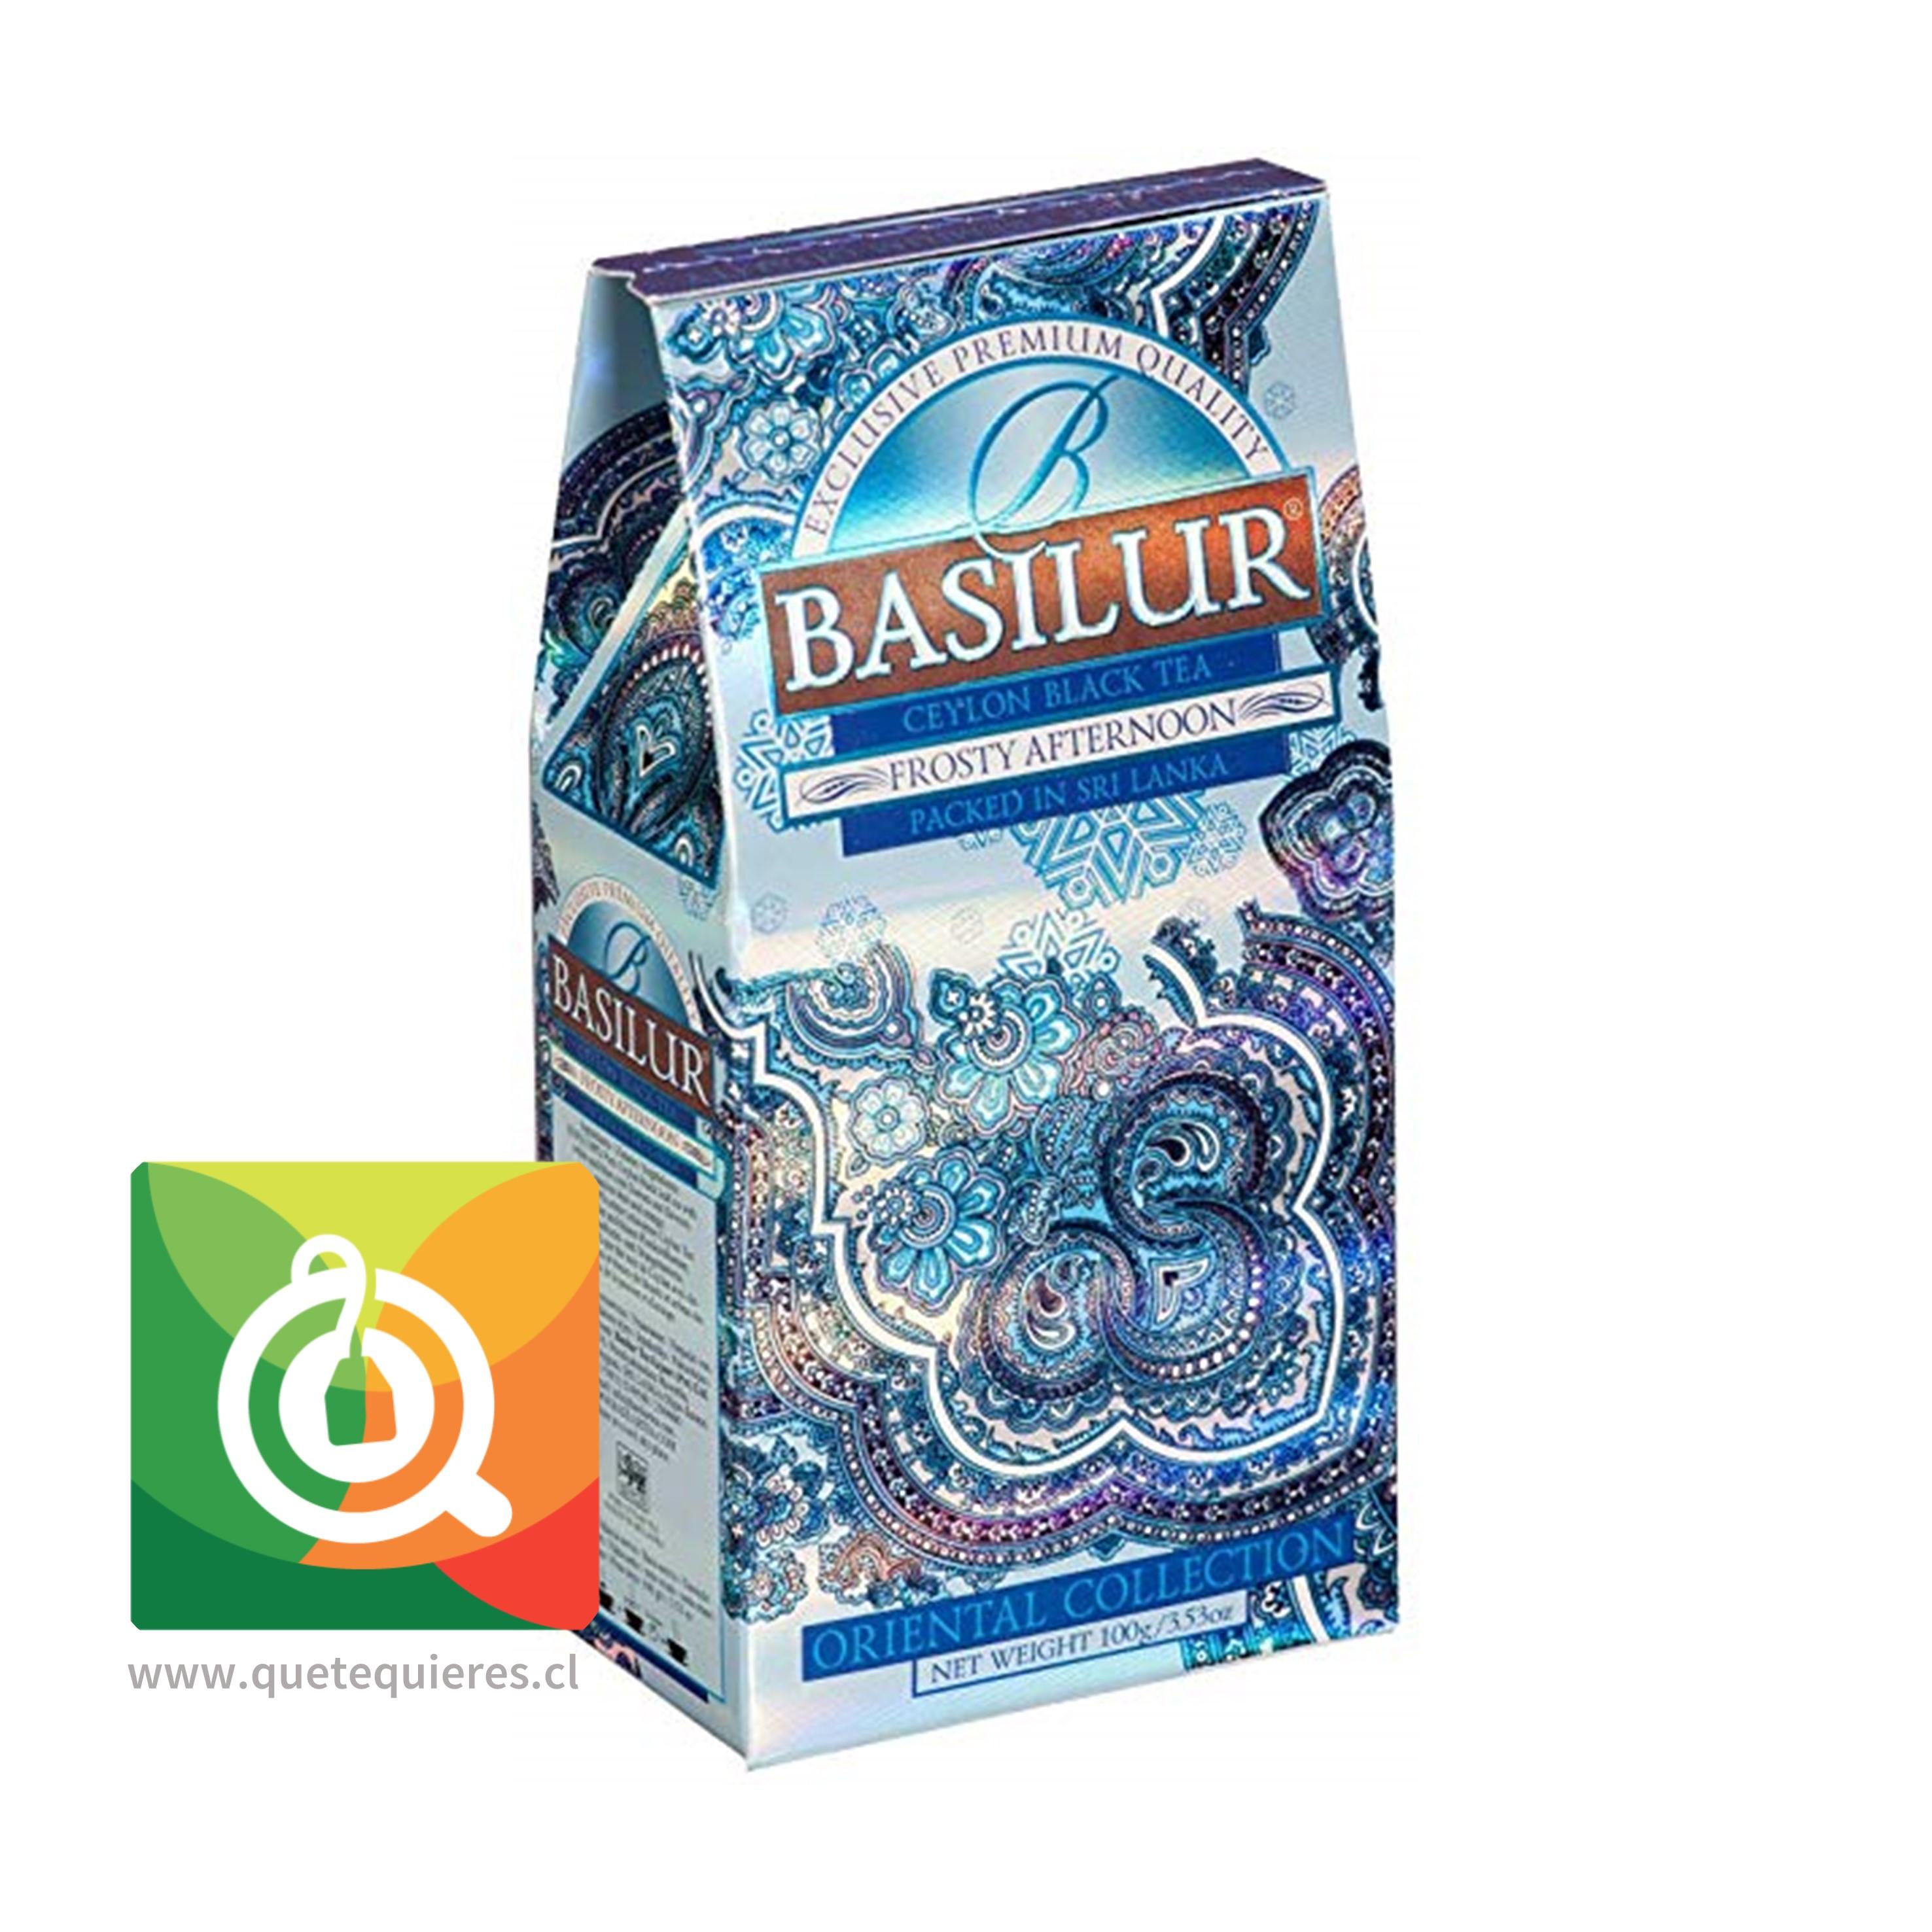 Basilur Té Negro Frosty Afternoon - Ceylon Black Tea Frosty Afternoon- Image 1